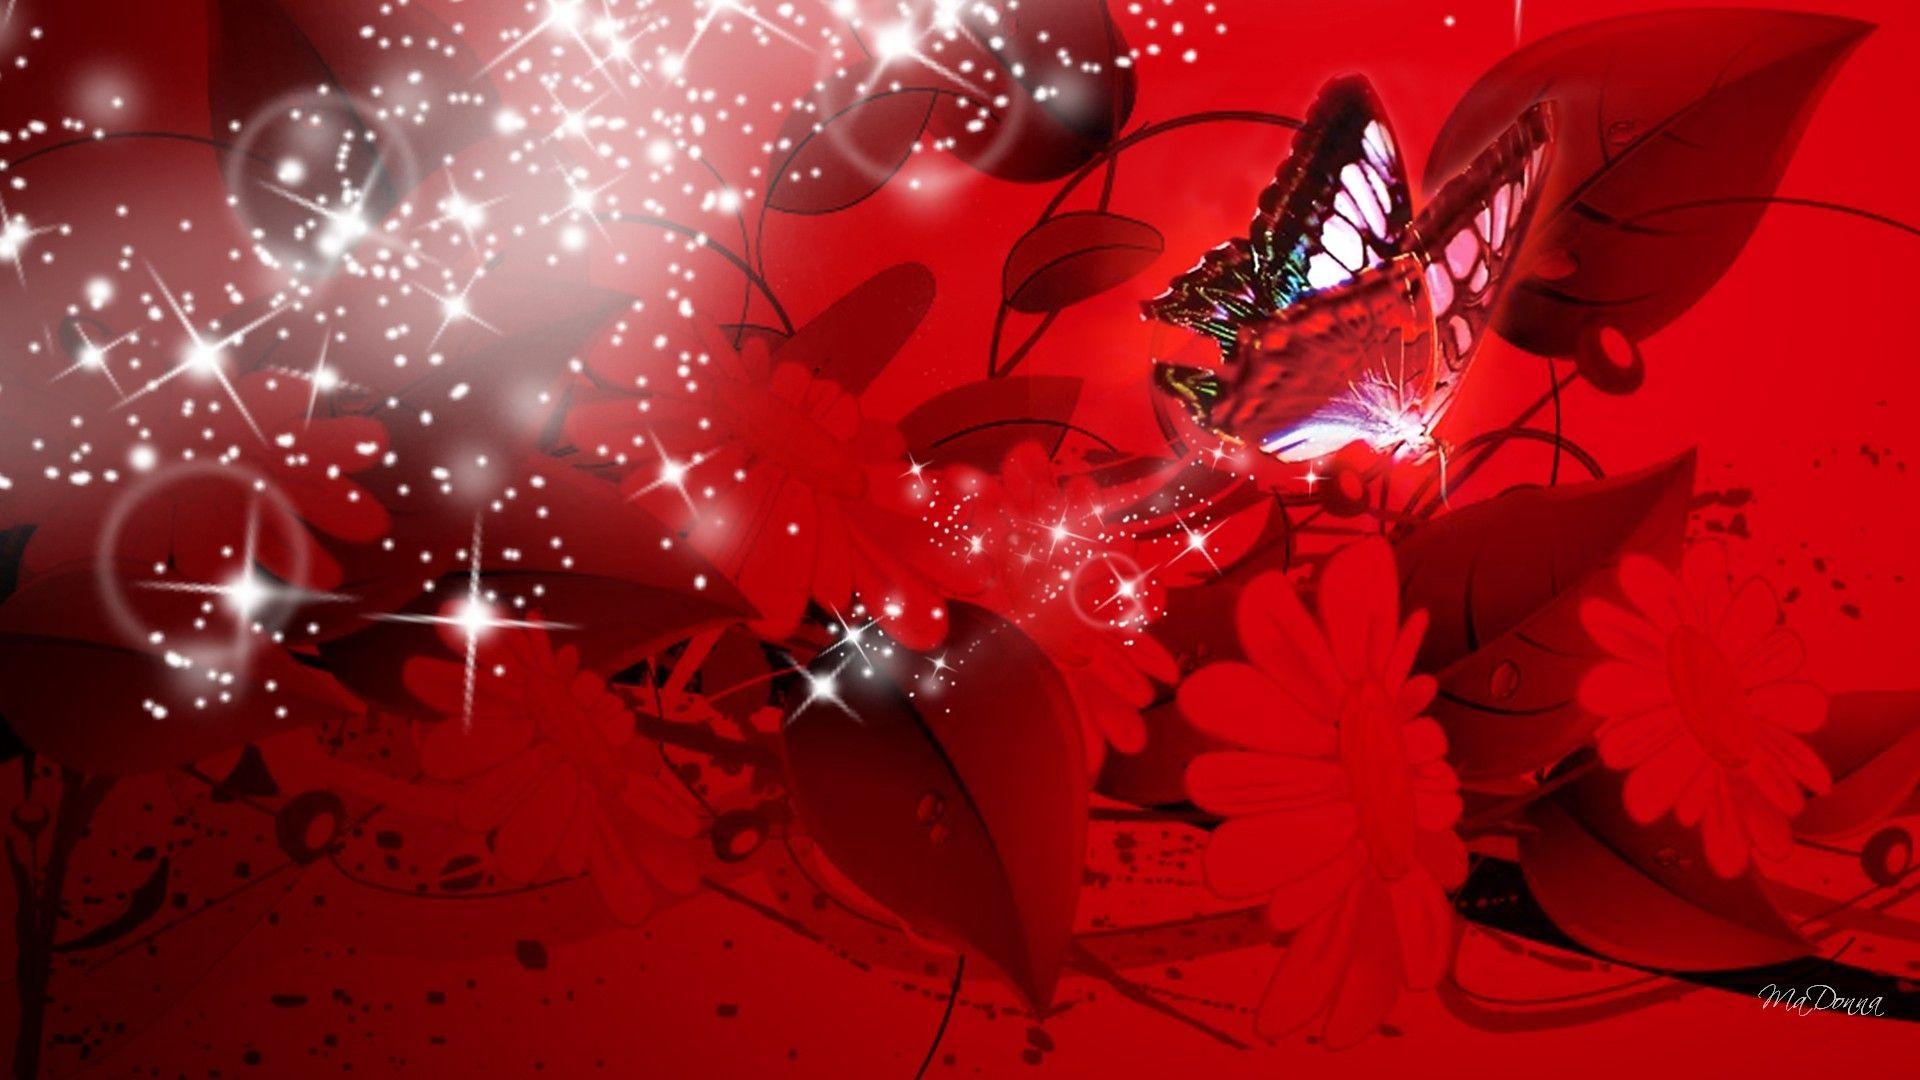 Res: 1920x1080, Red-Butterfly-Full-HD-Wallpaper.jpg (1920×1080)